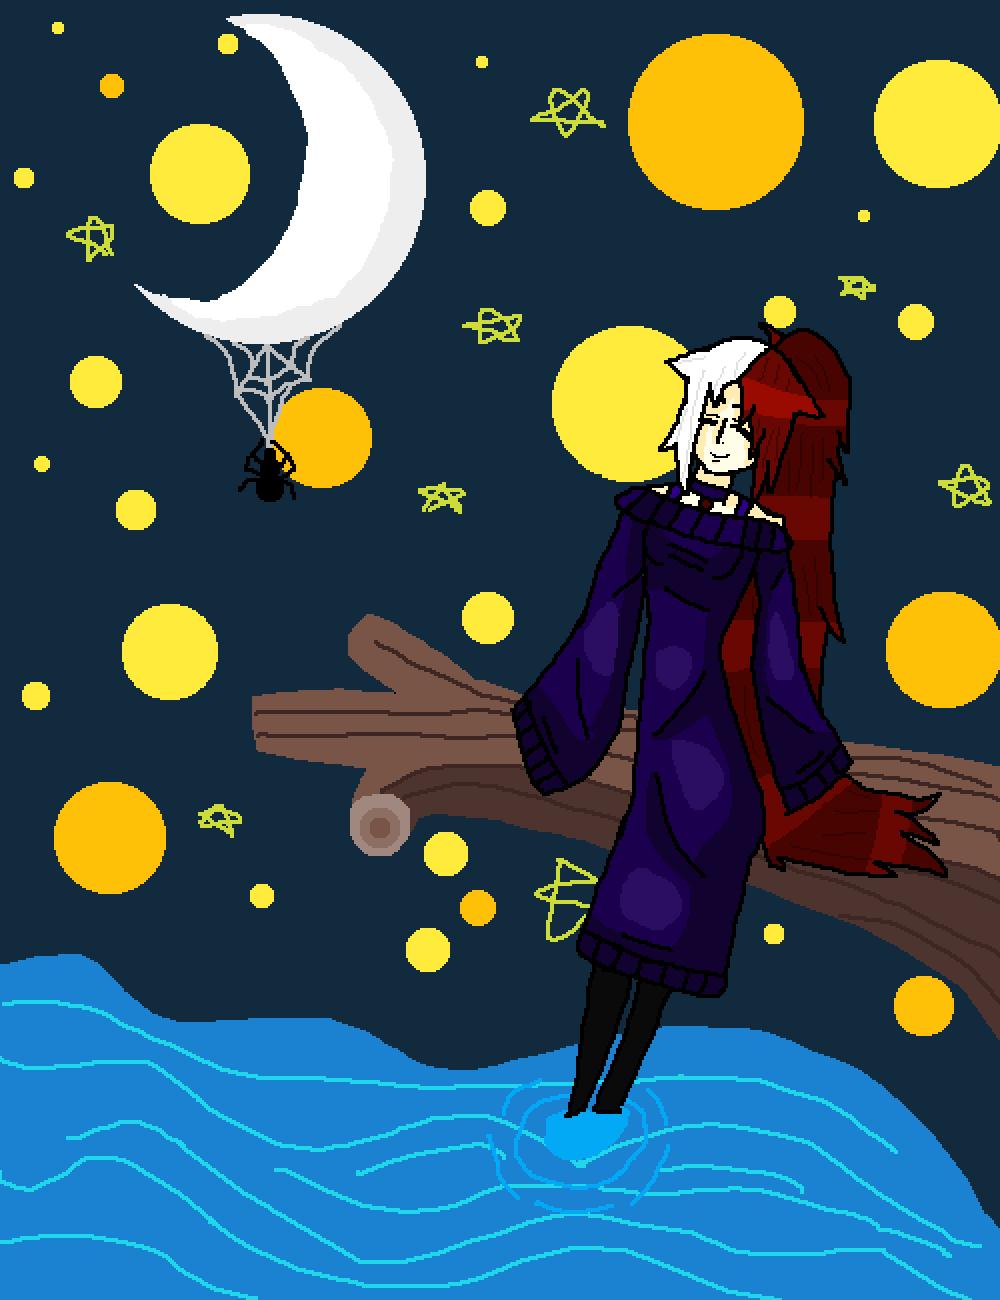 Am loving the night sky